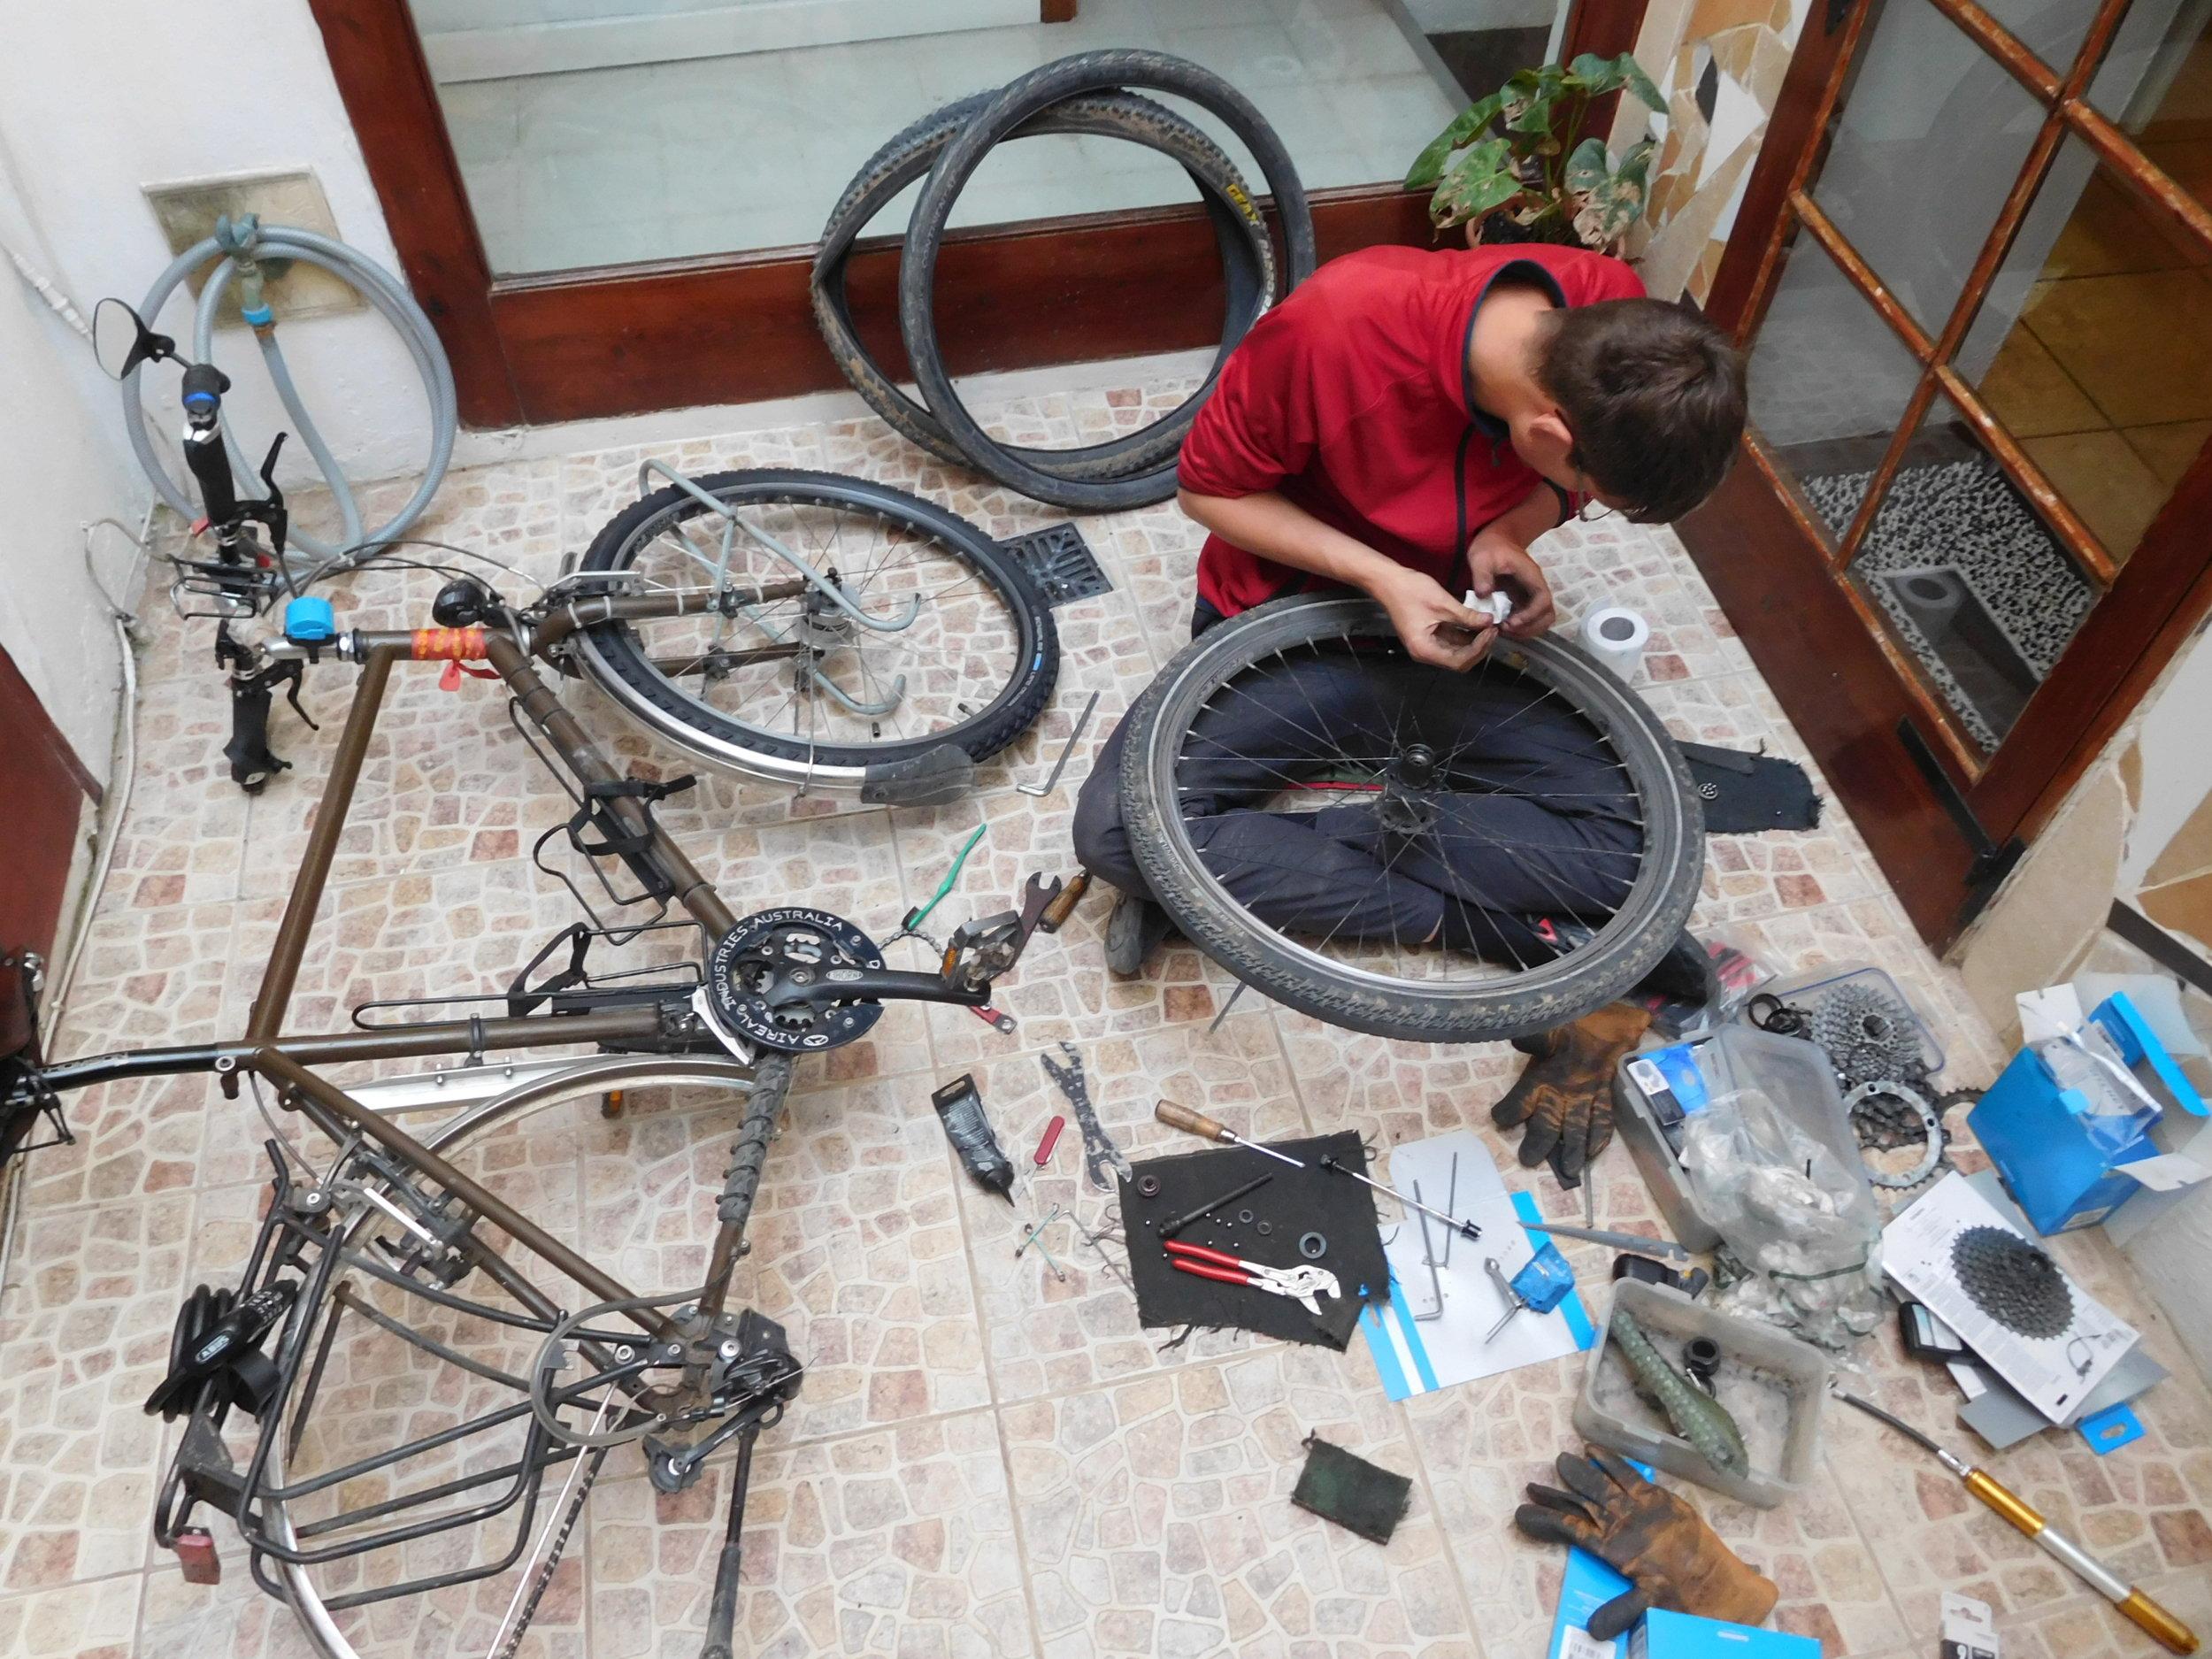 14. Working on Bikes.JPG